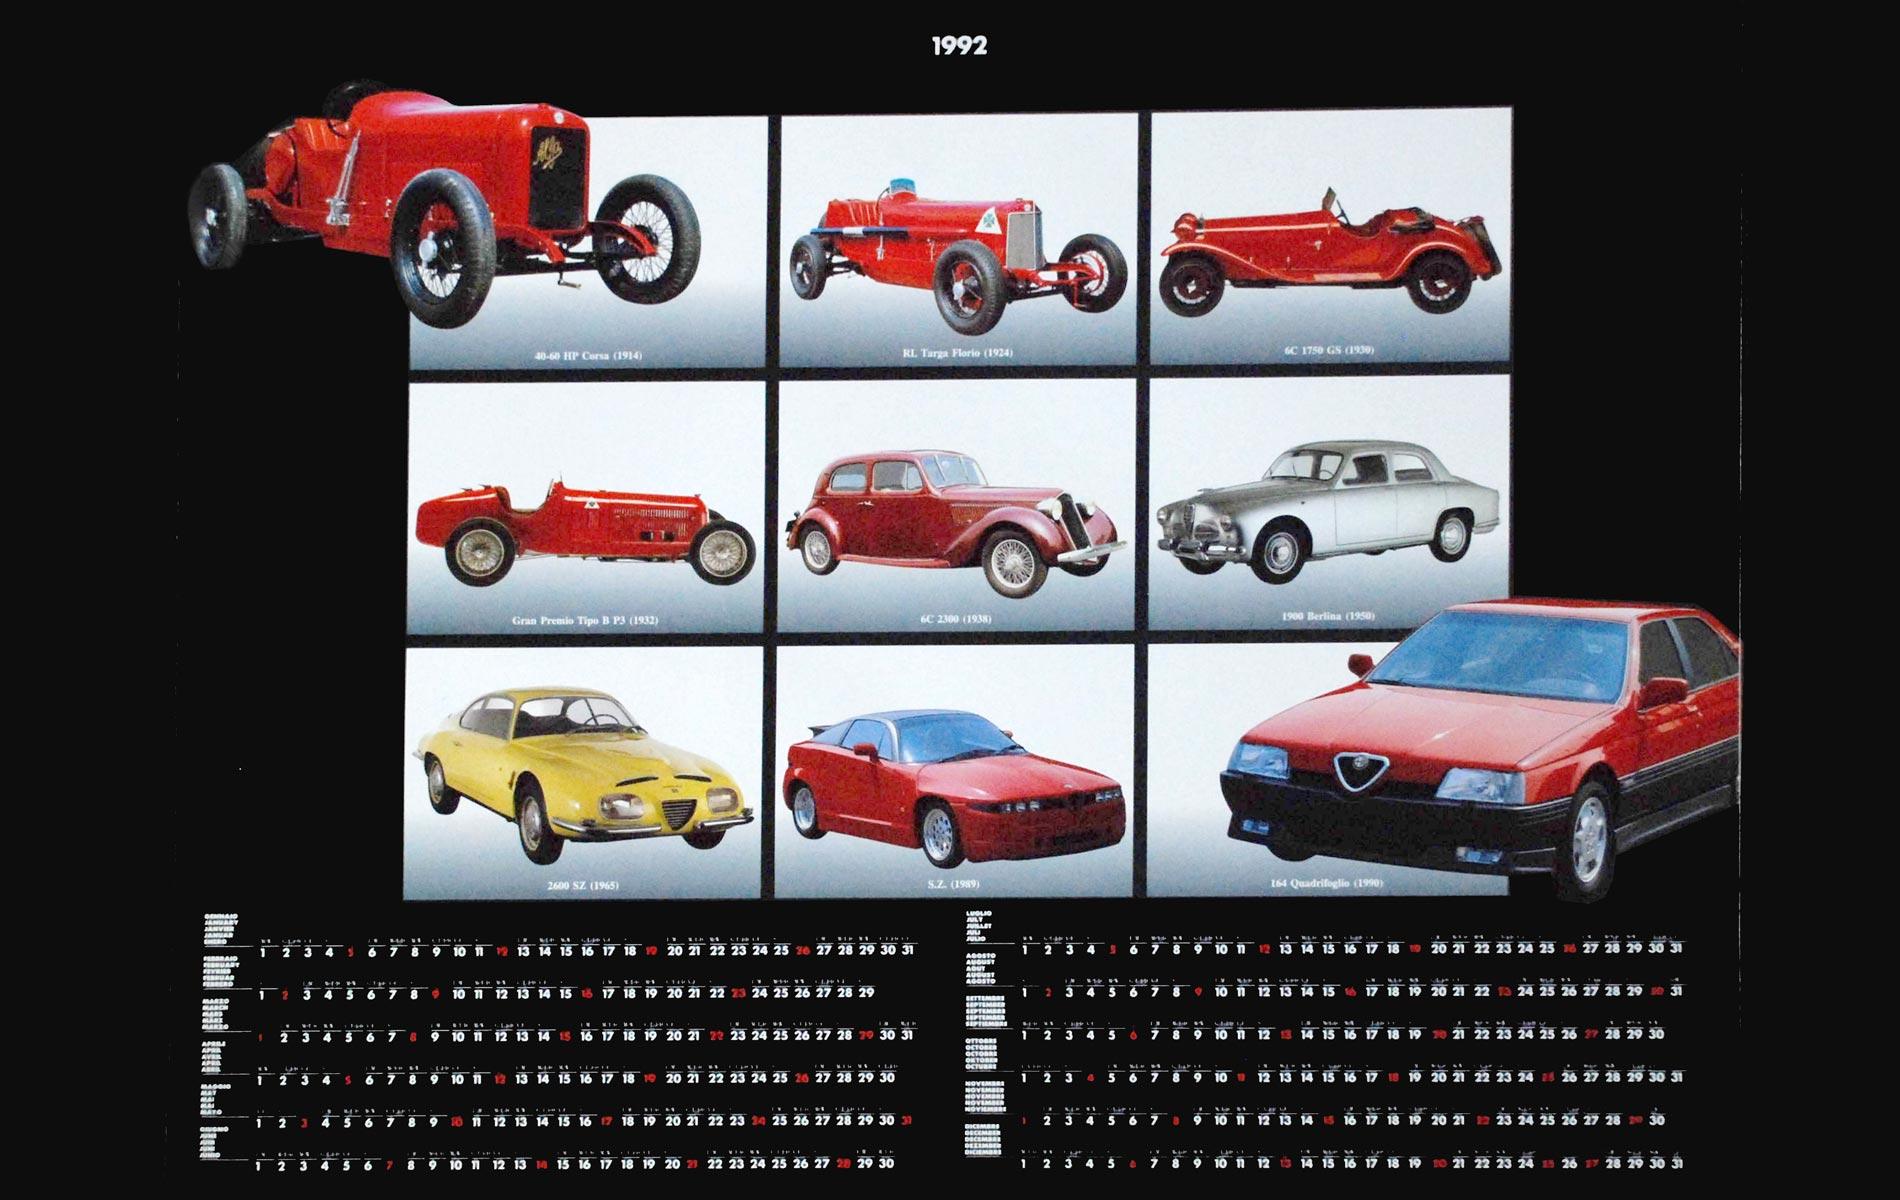 ALFA ROMEO - 1991 CALENDAR - The cars selected for the photos c